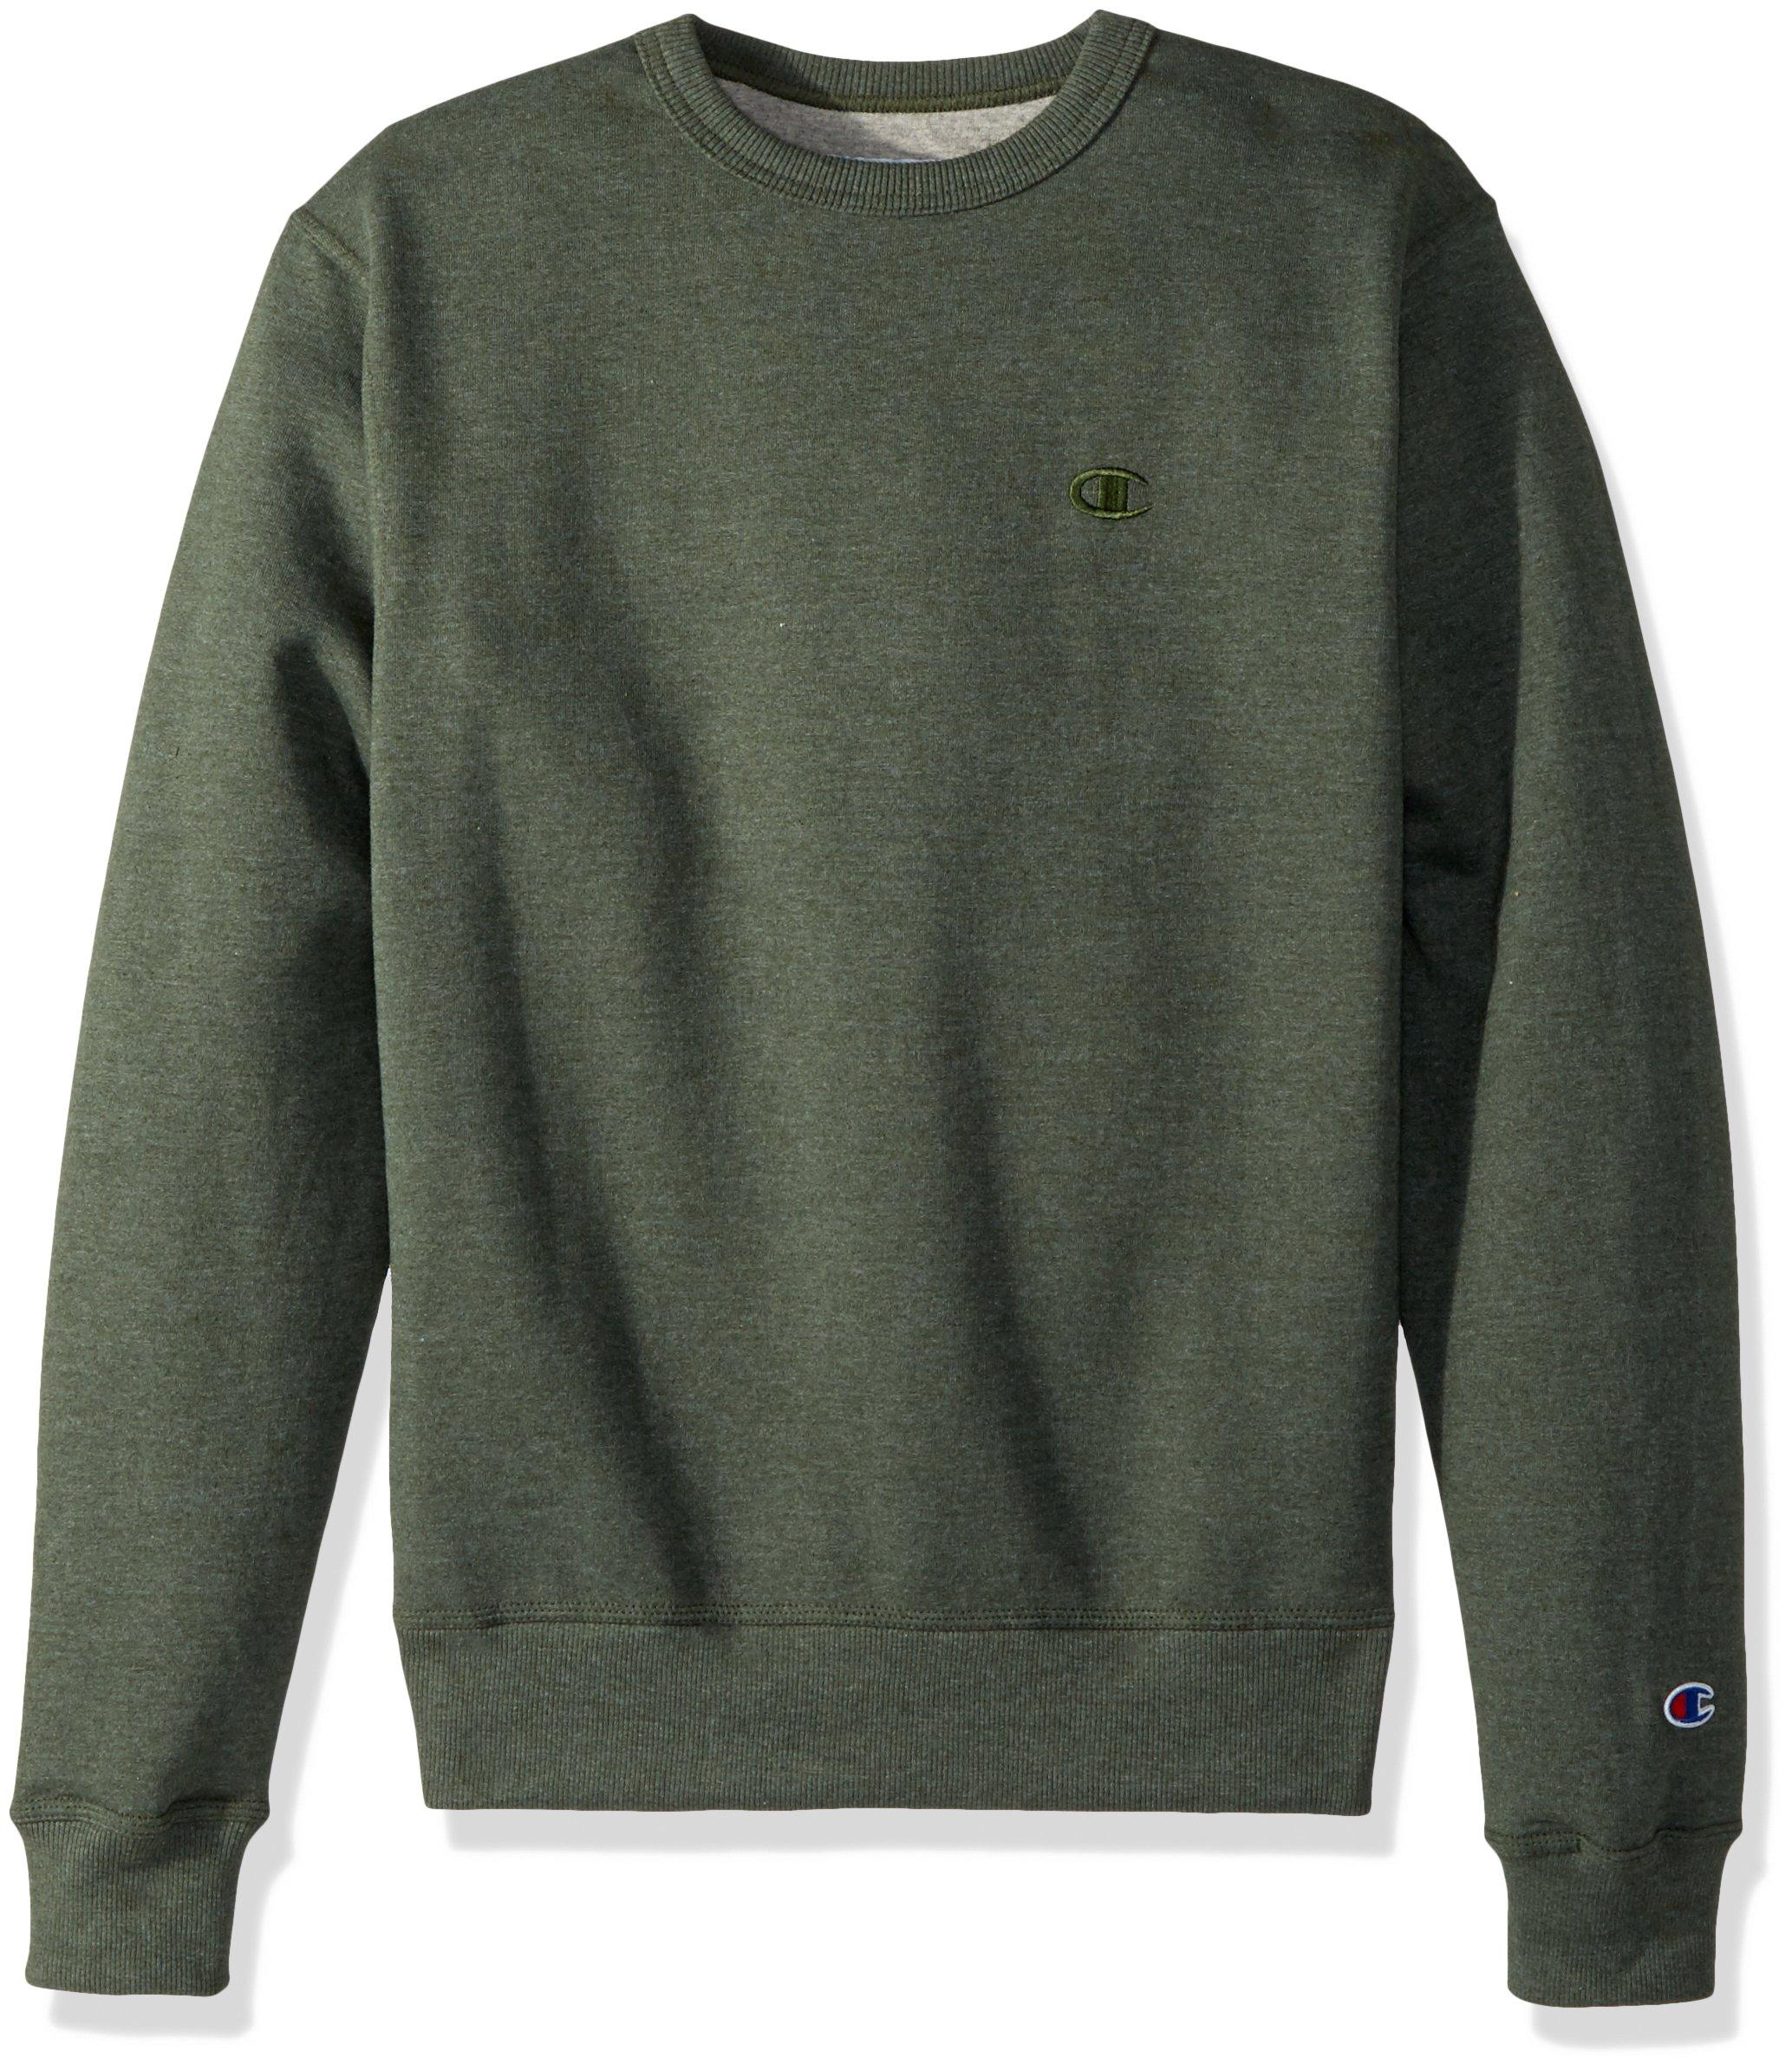 Champion Men's Powerblend Fleece Pullover Sweatshirt, Forest Grove Heather Small